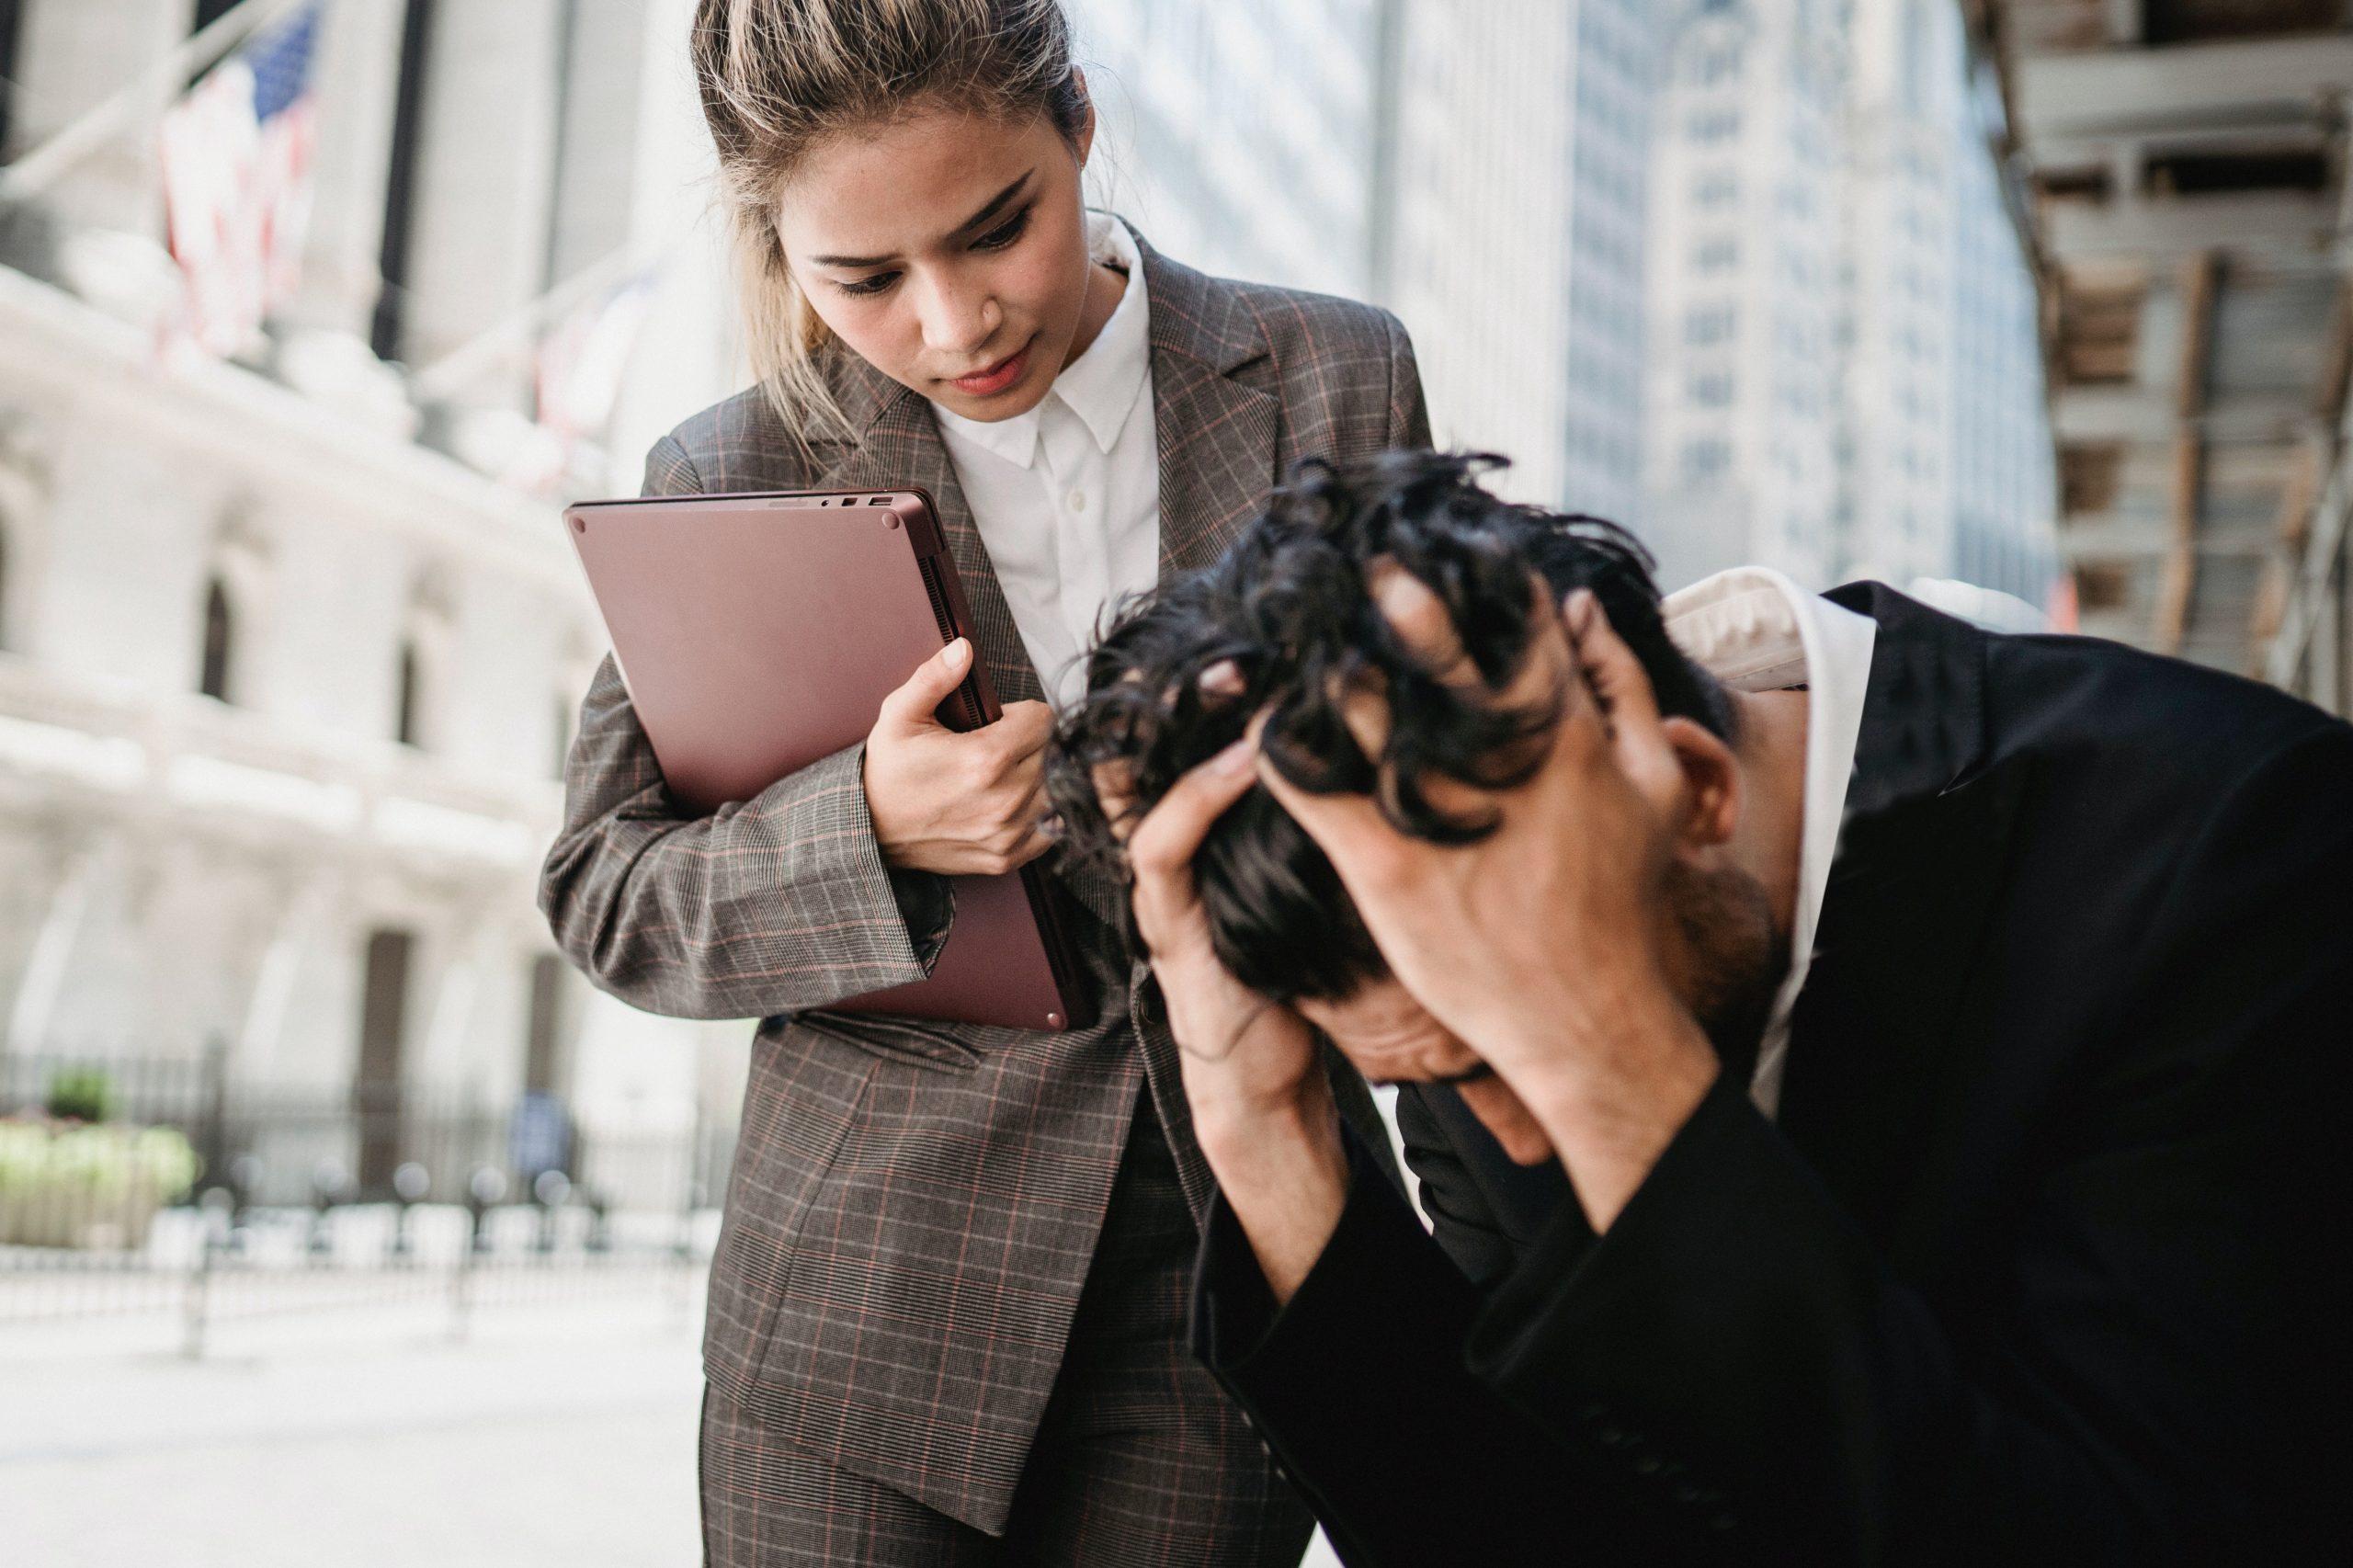 a woman calming down a worried man